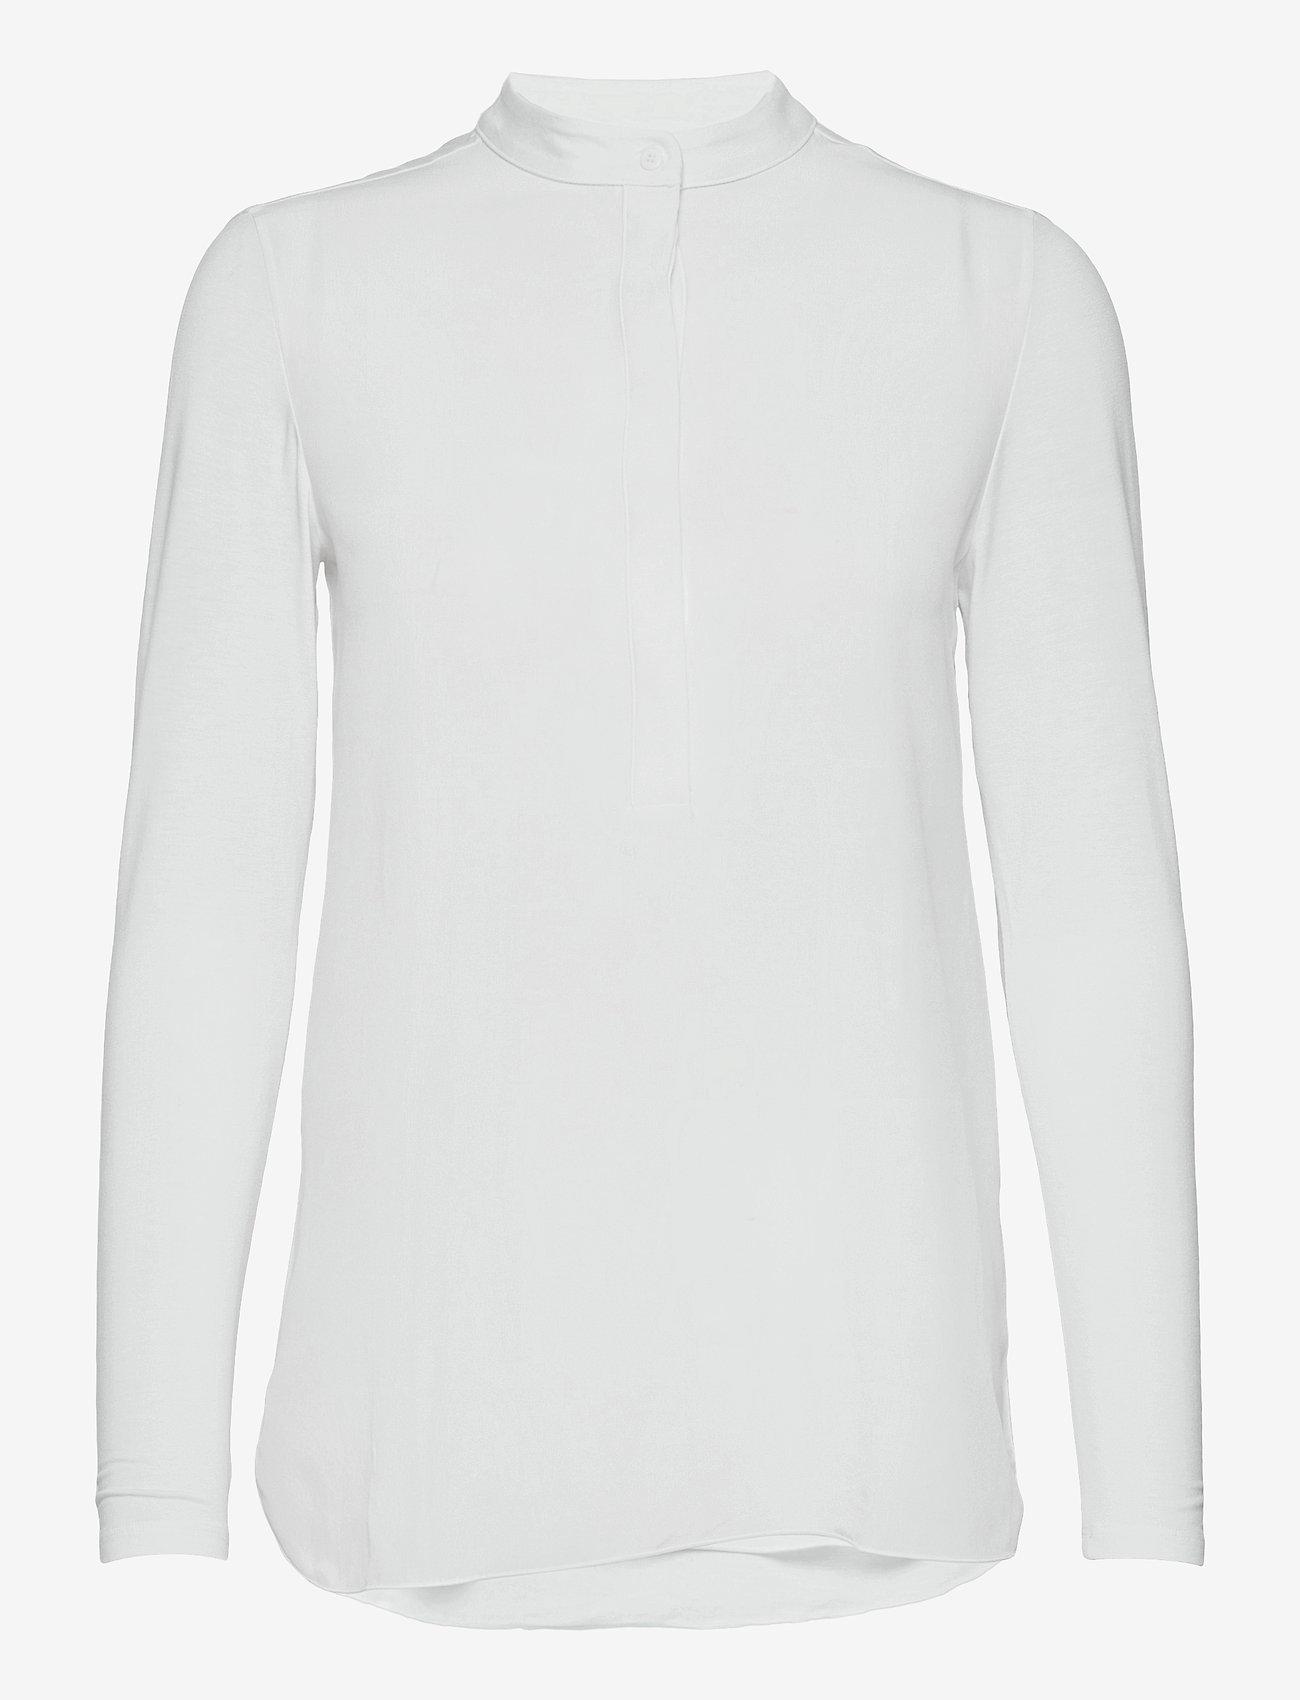 Max Mara Leisure - HAITI - long sleeved blouses - optical white - 0